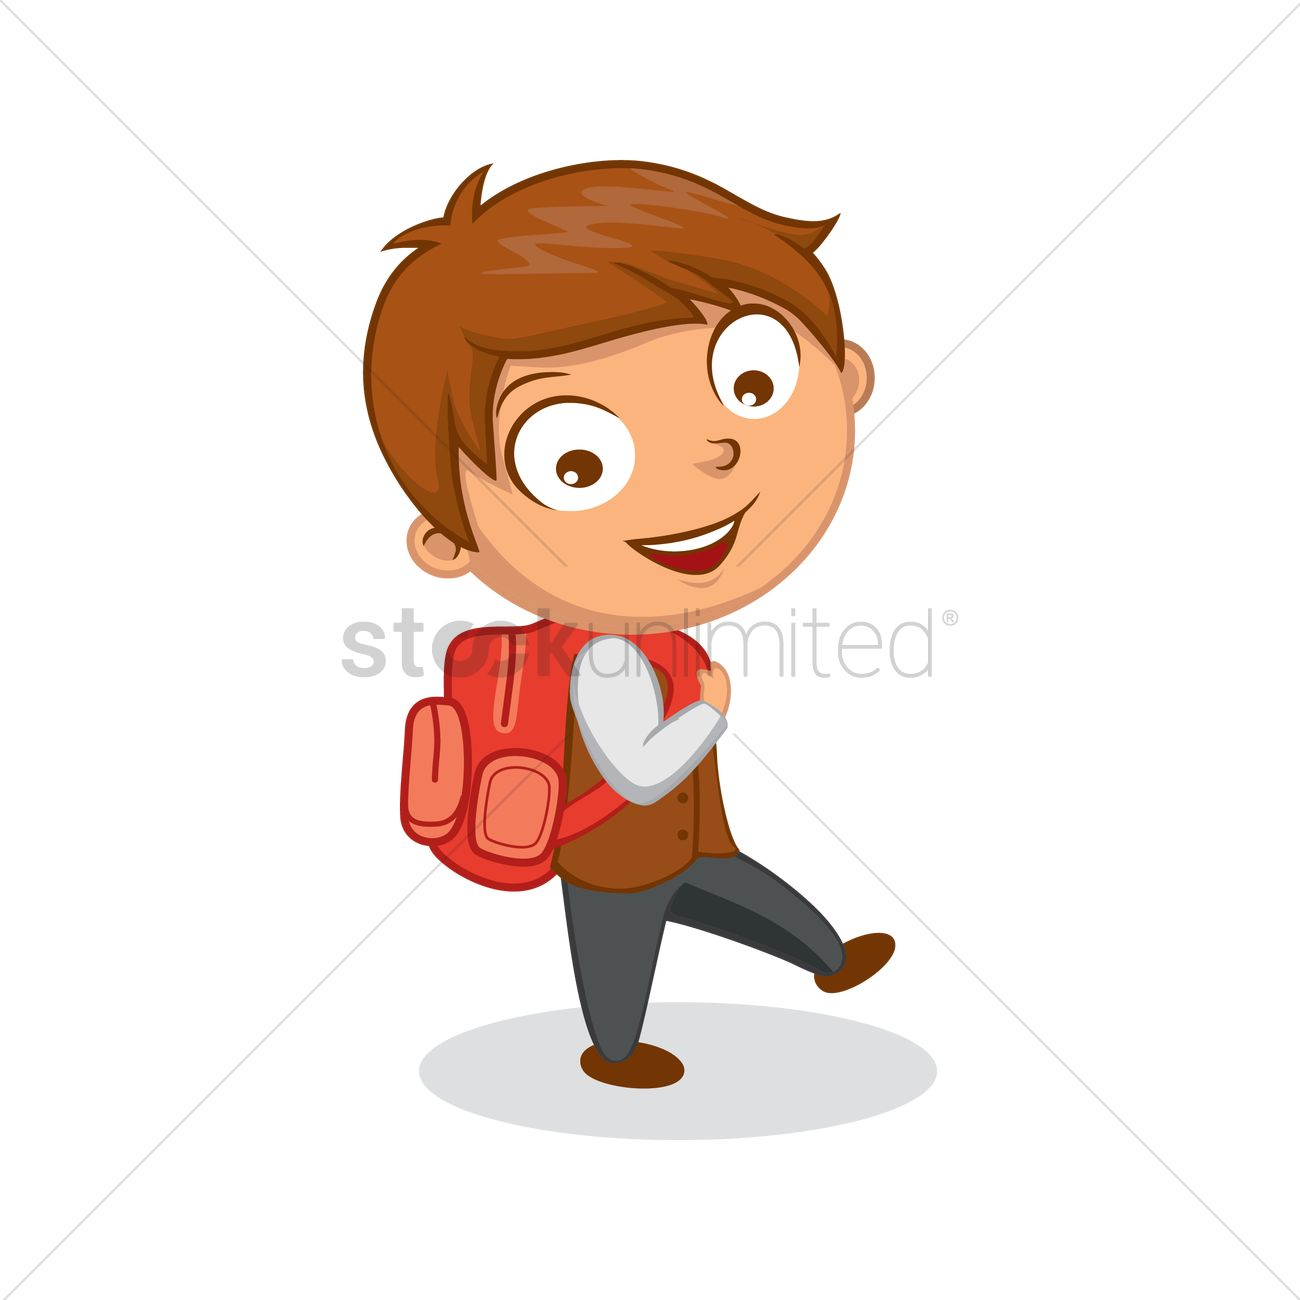 free school boy walking to school vector graphic - Cartoon Boy Images Free